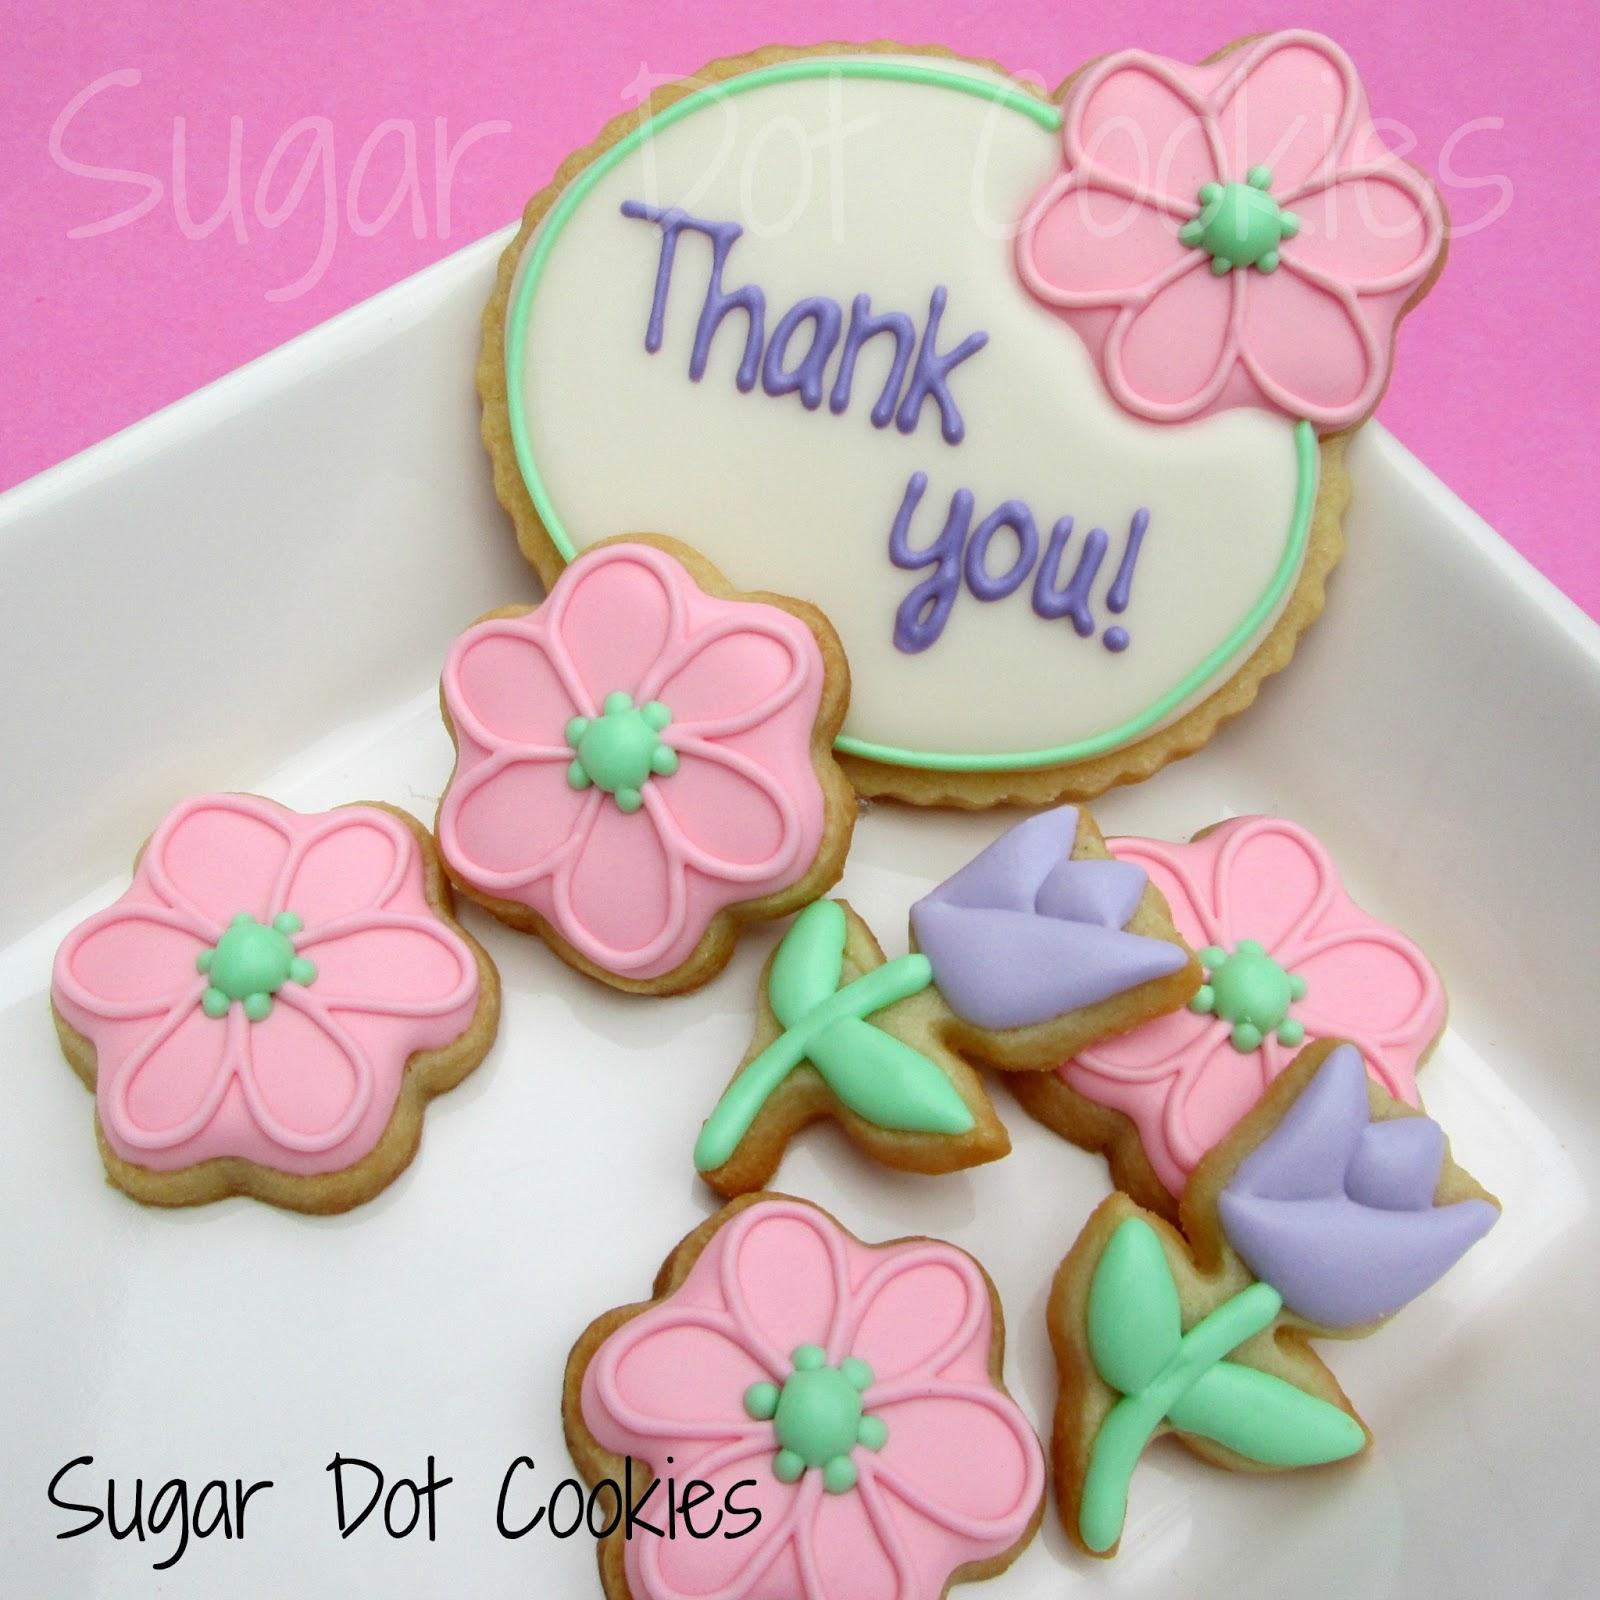 Sugar Dot Cookies: Thank You Cookies